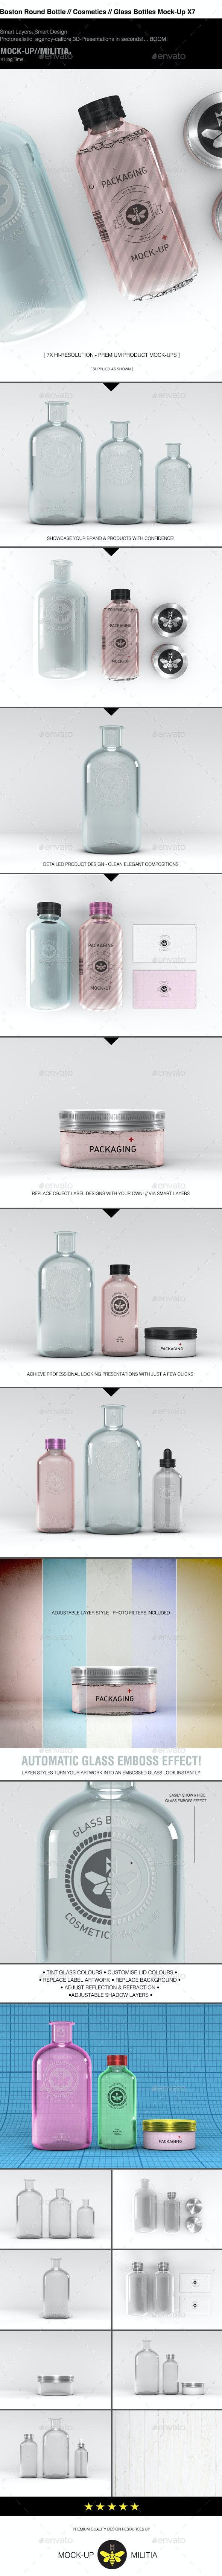 Cosmetics Mock-Up   Boston Round Bottle Mock-Up - Beauty Packaging